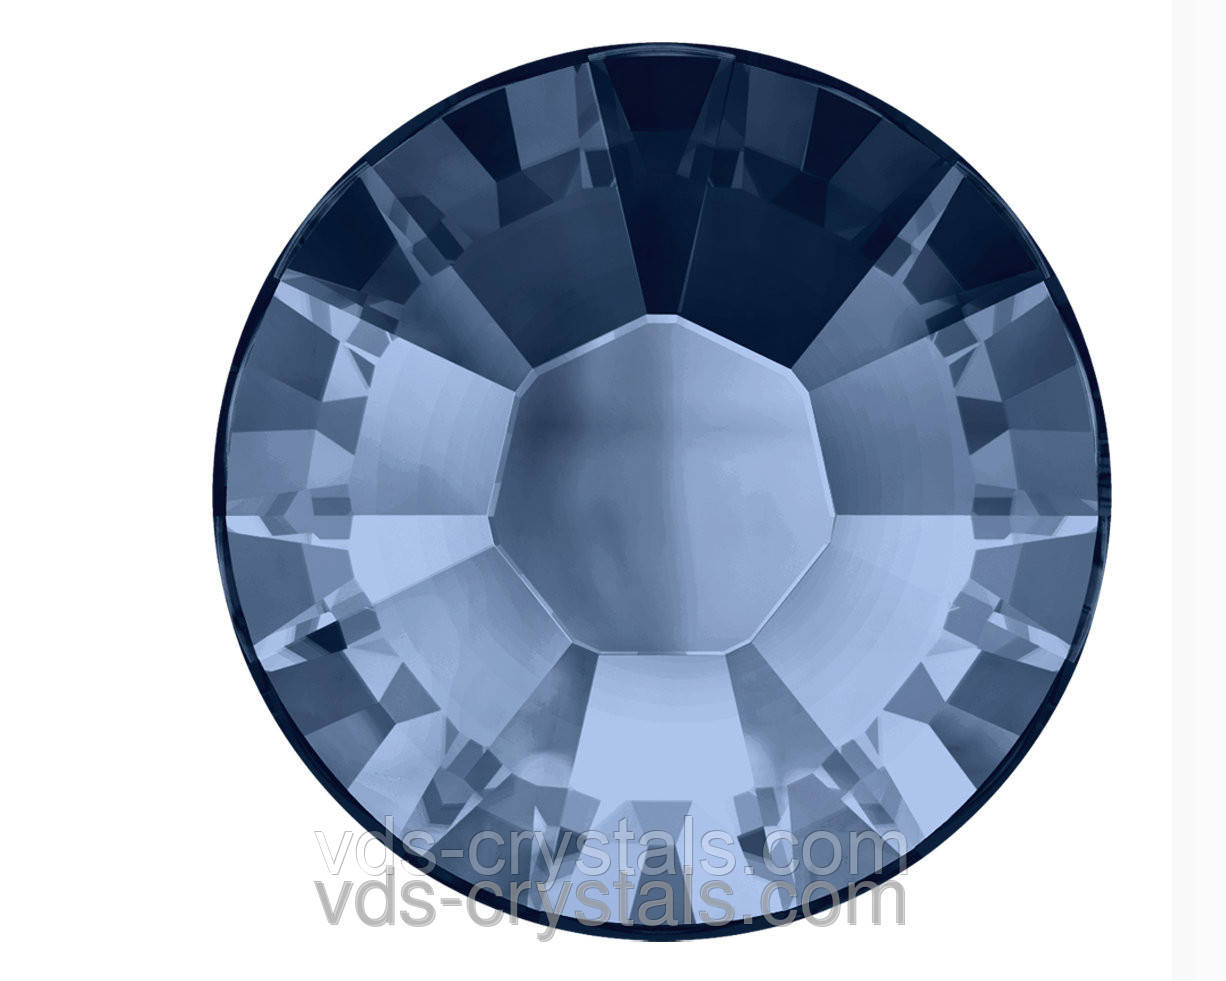 Кристаллы Swarovski клеевые холодной фиксации 2058 Montana F (207)